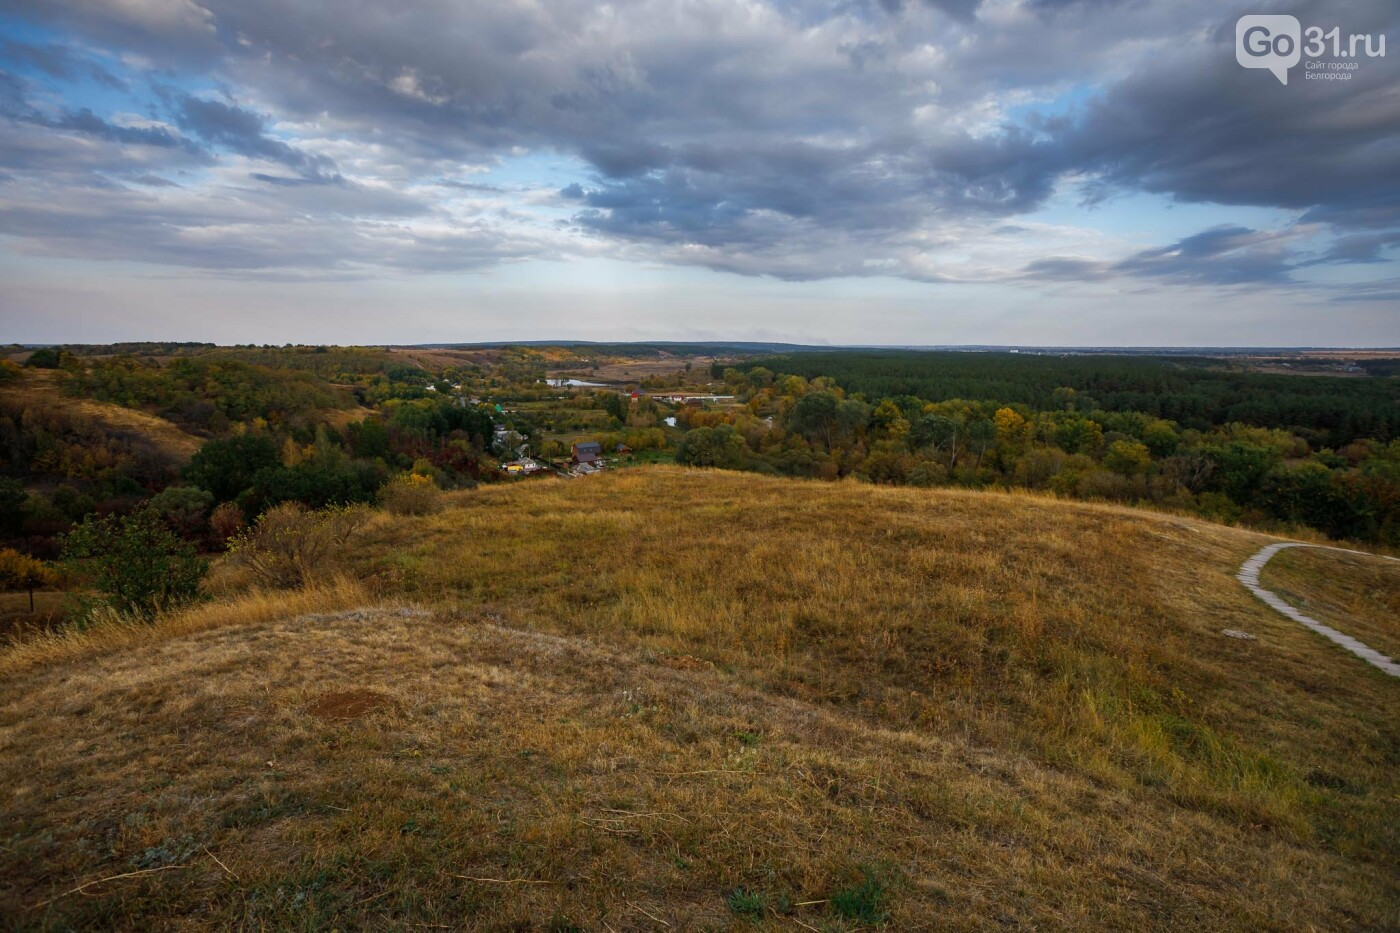 Хотмыжск – по-осеннему. Фоторепортаж, фото-19, Фото: Антон Вергун